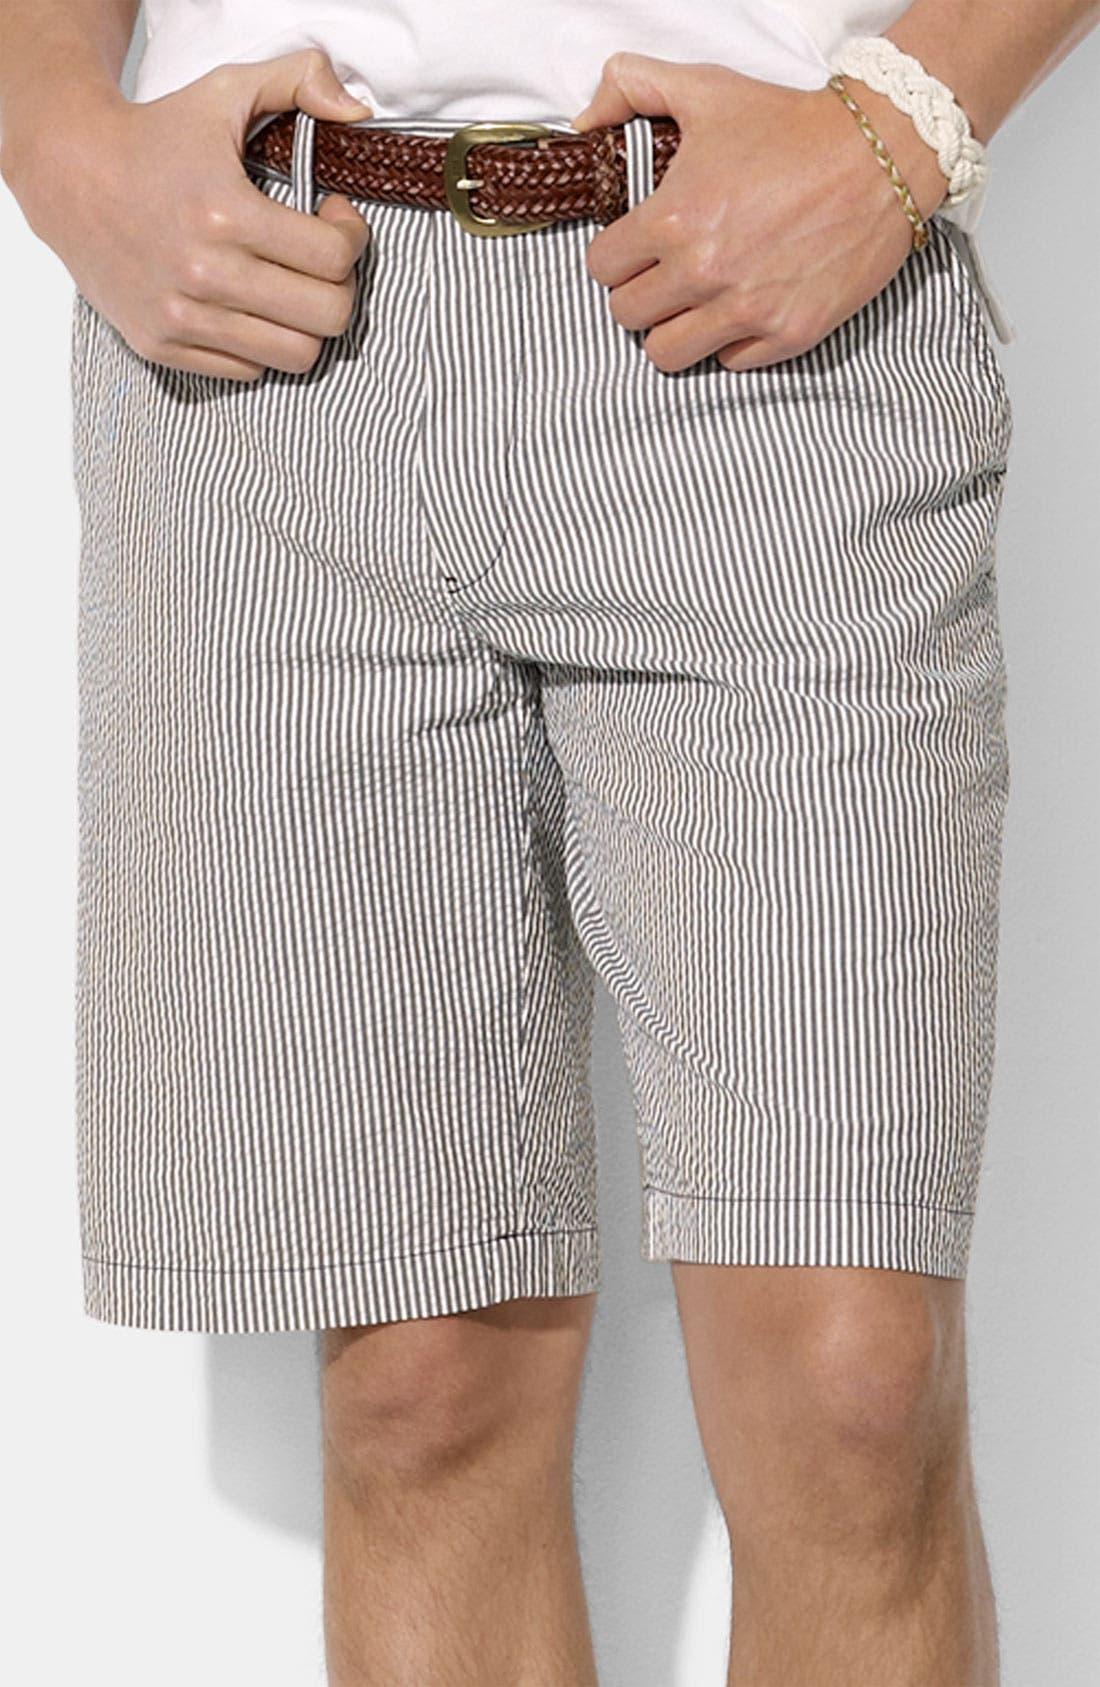 Alternate Image 1 Selected - Polo Ralph Lauren 'Bradbury' Shorts